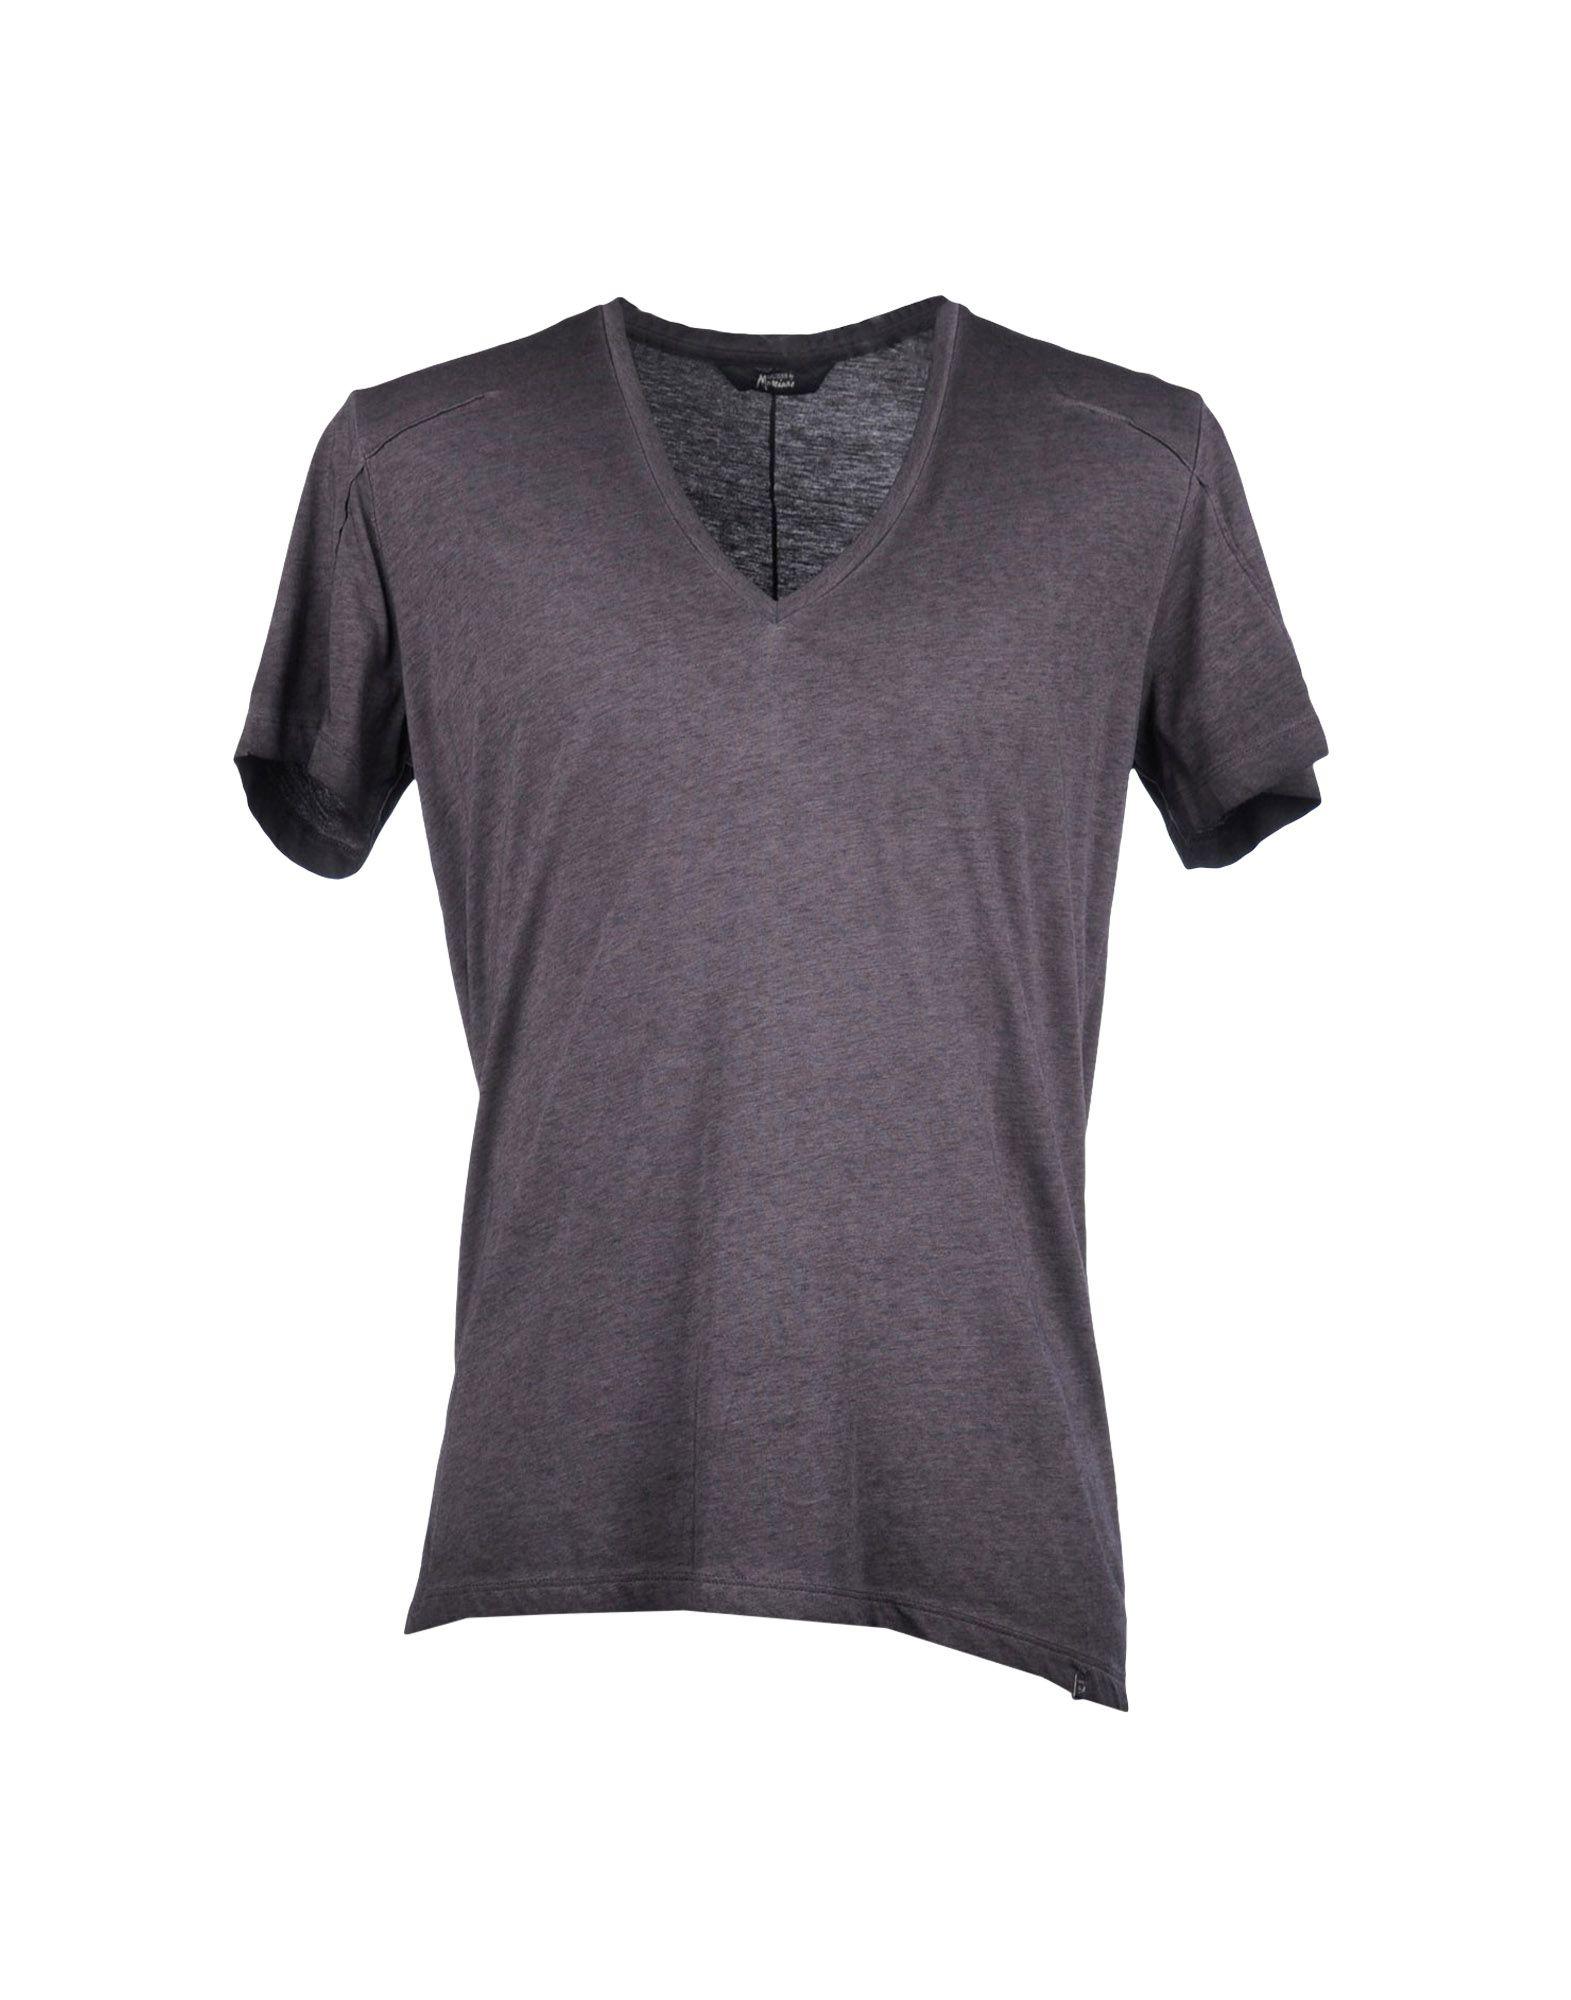 guess short sleeve t shirt in purple for men dark brown. Black Bedroom Furniture Sets. Home Design Ideas